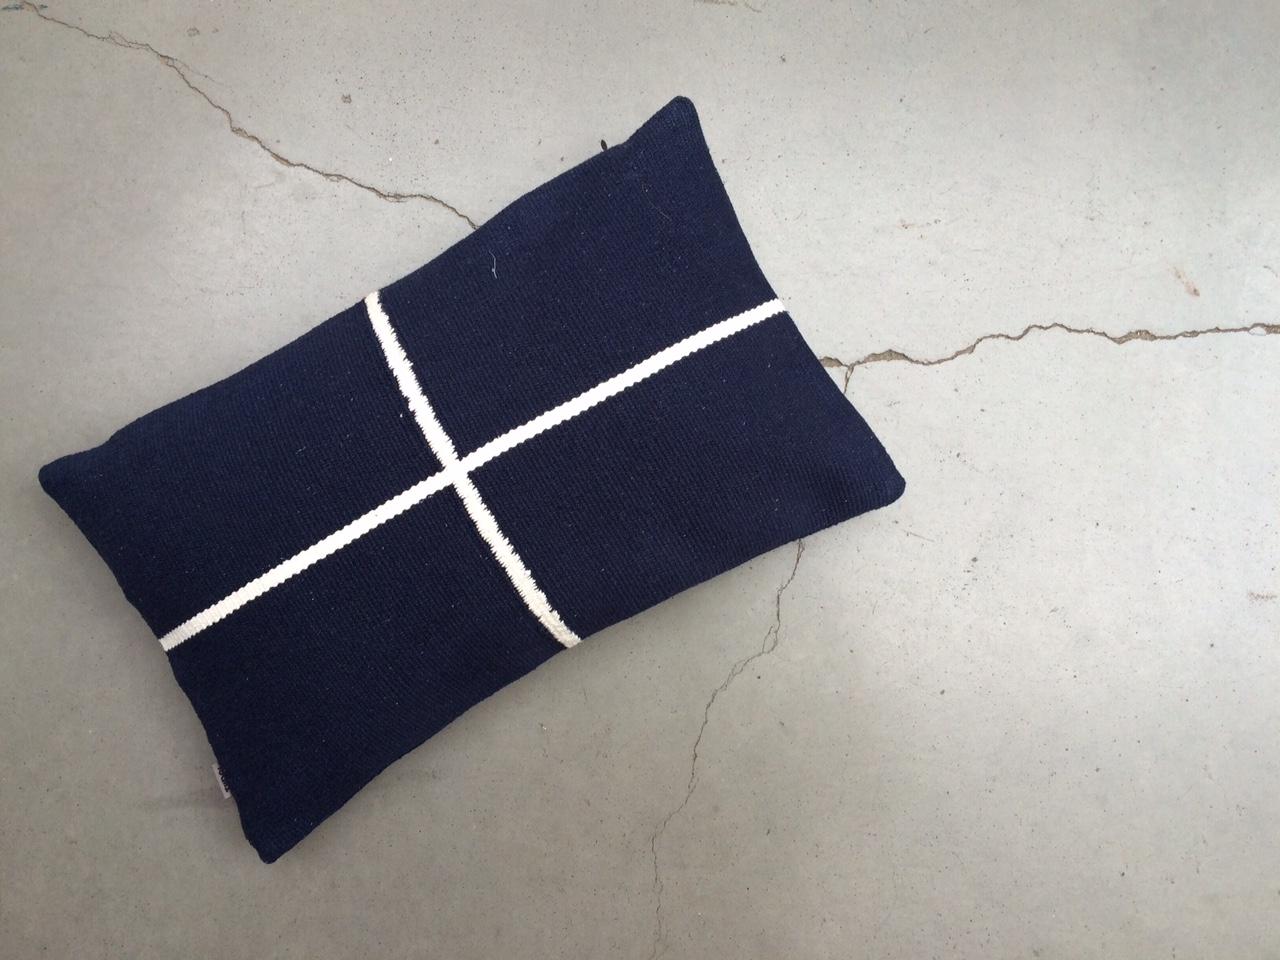 Jama-khan rectangular cushion - 30 x 50 cms 100% handwoven cotton